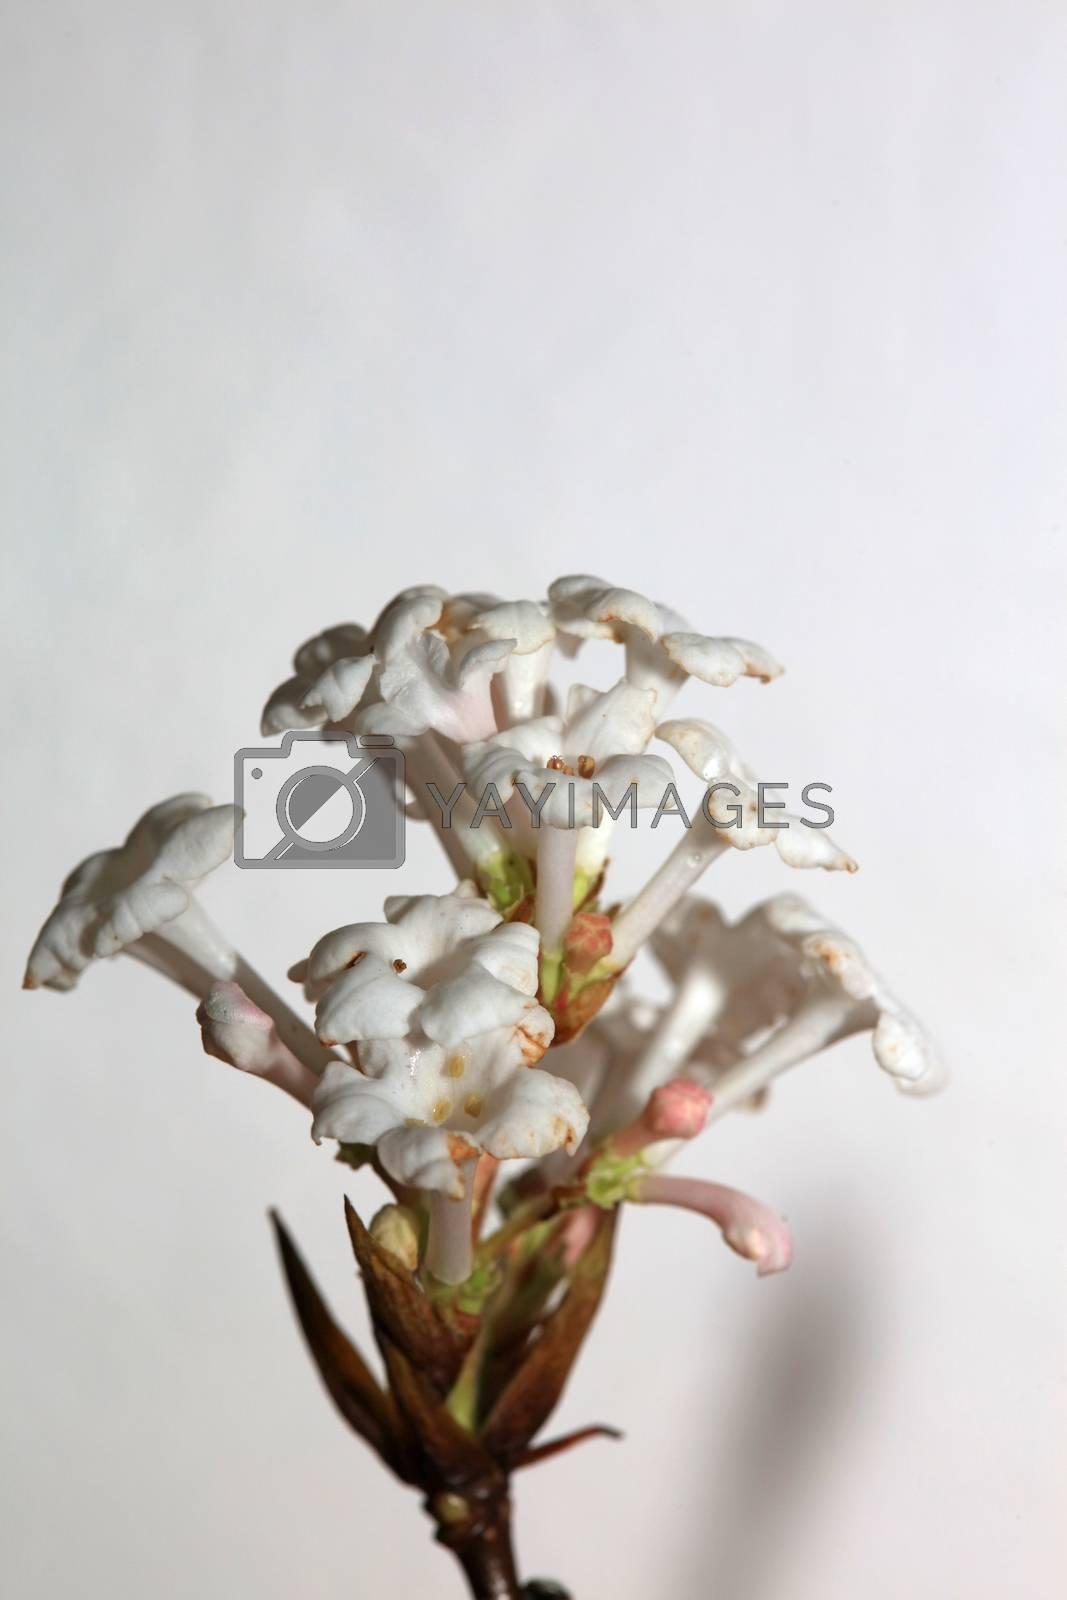 White flower blossom viburnum farreri steam family adoxaceae macro modern high quality background print